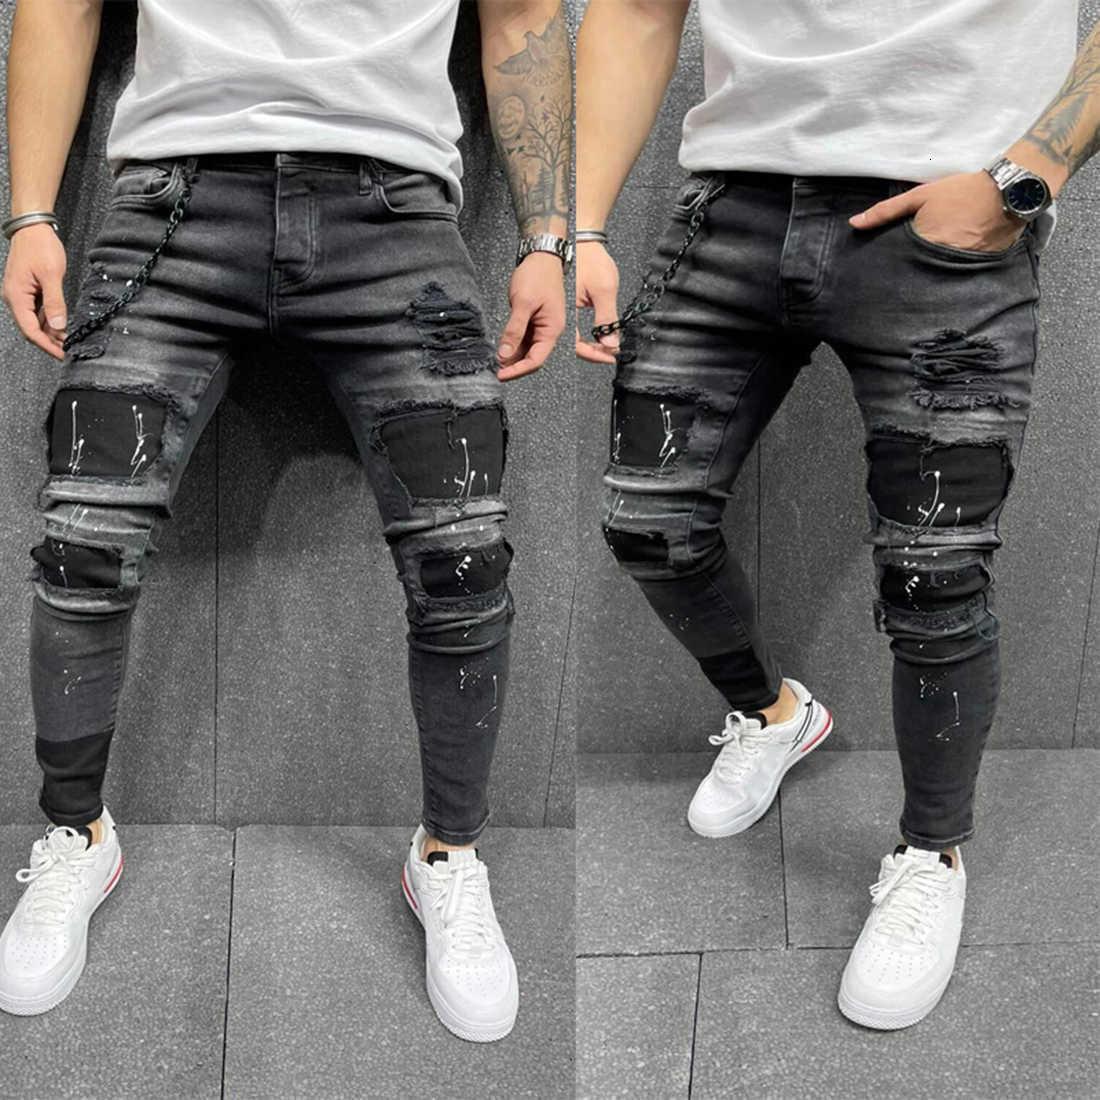 Men Ripped Ny Jeans High Quality Black Patchwork Biker Pencil Locomotive Denim Pants Streets Hip Hop Cowboy Trousers